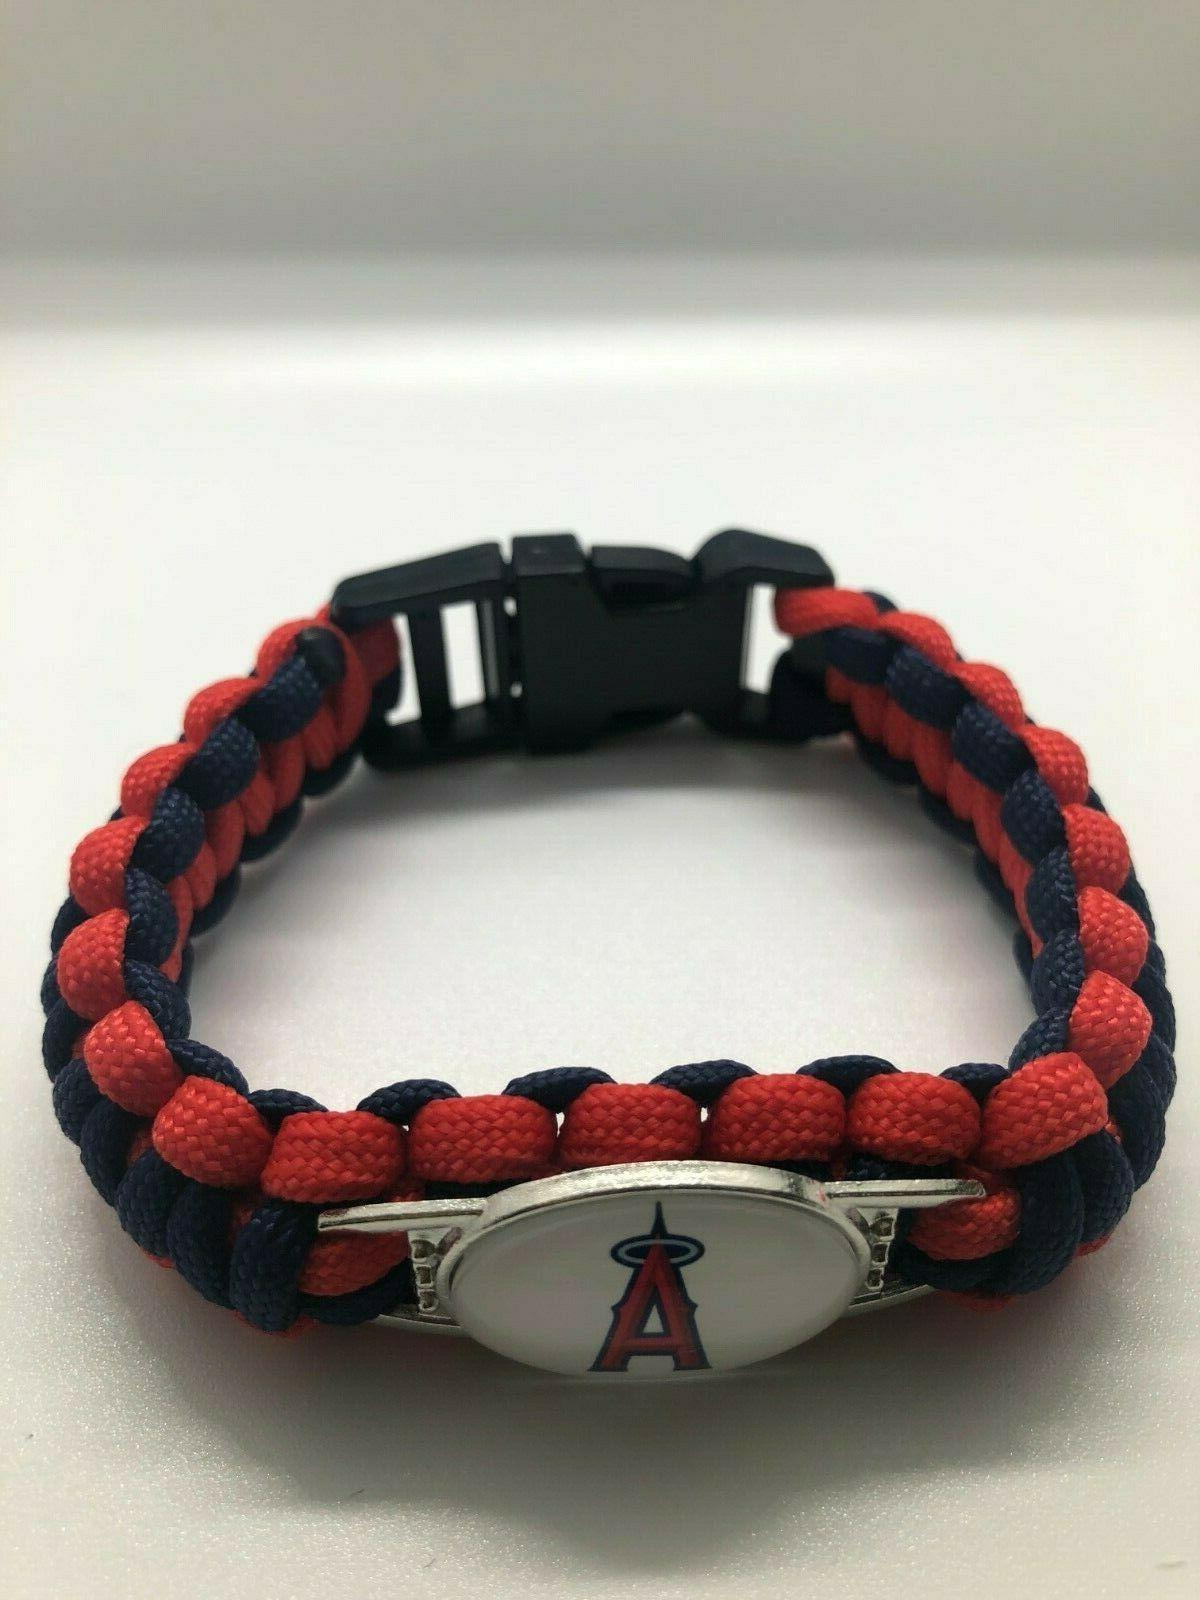 MLB Bracelet Wrap Wristband